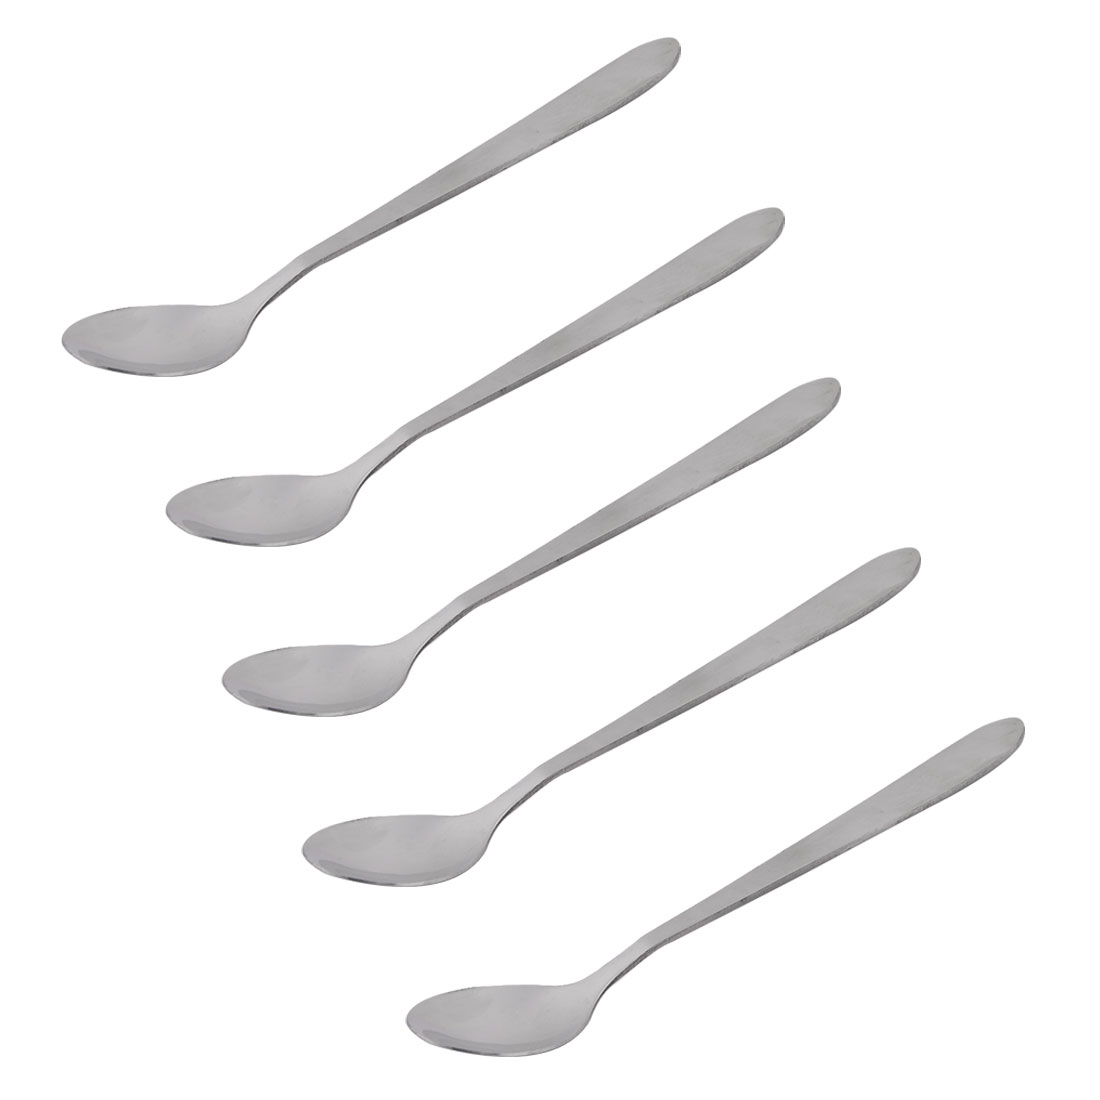 Coffee Ice Cream Scoop Long Handle Spoon Silver Tone 14.7cm Length 5 PCS by Unique-Bargains